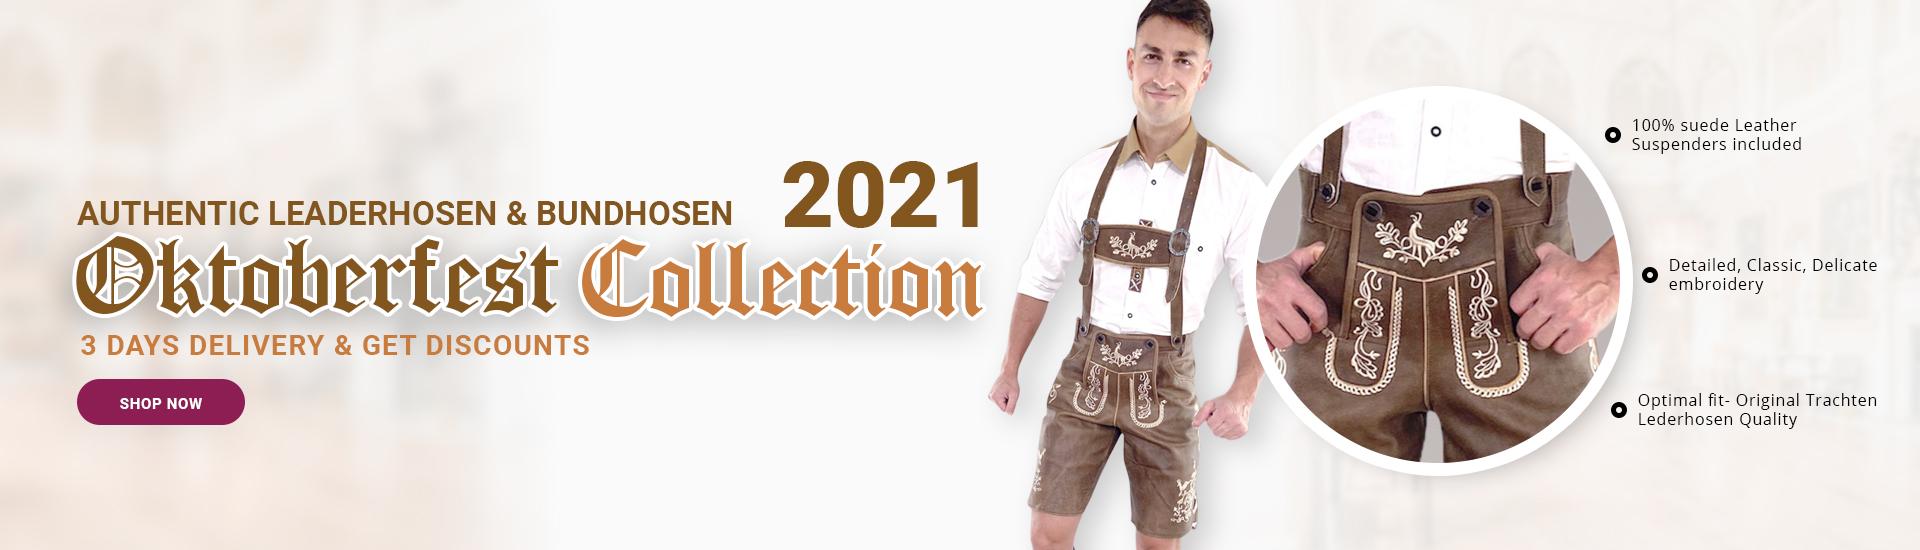 Oktoberfest Collection 2021 Lederhosen